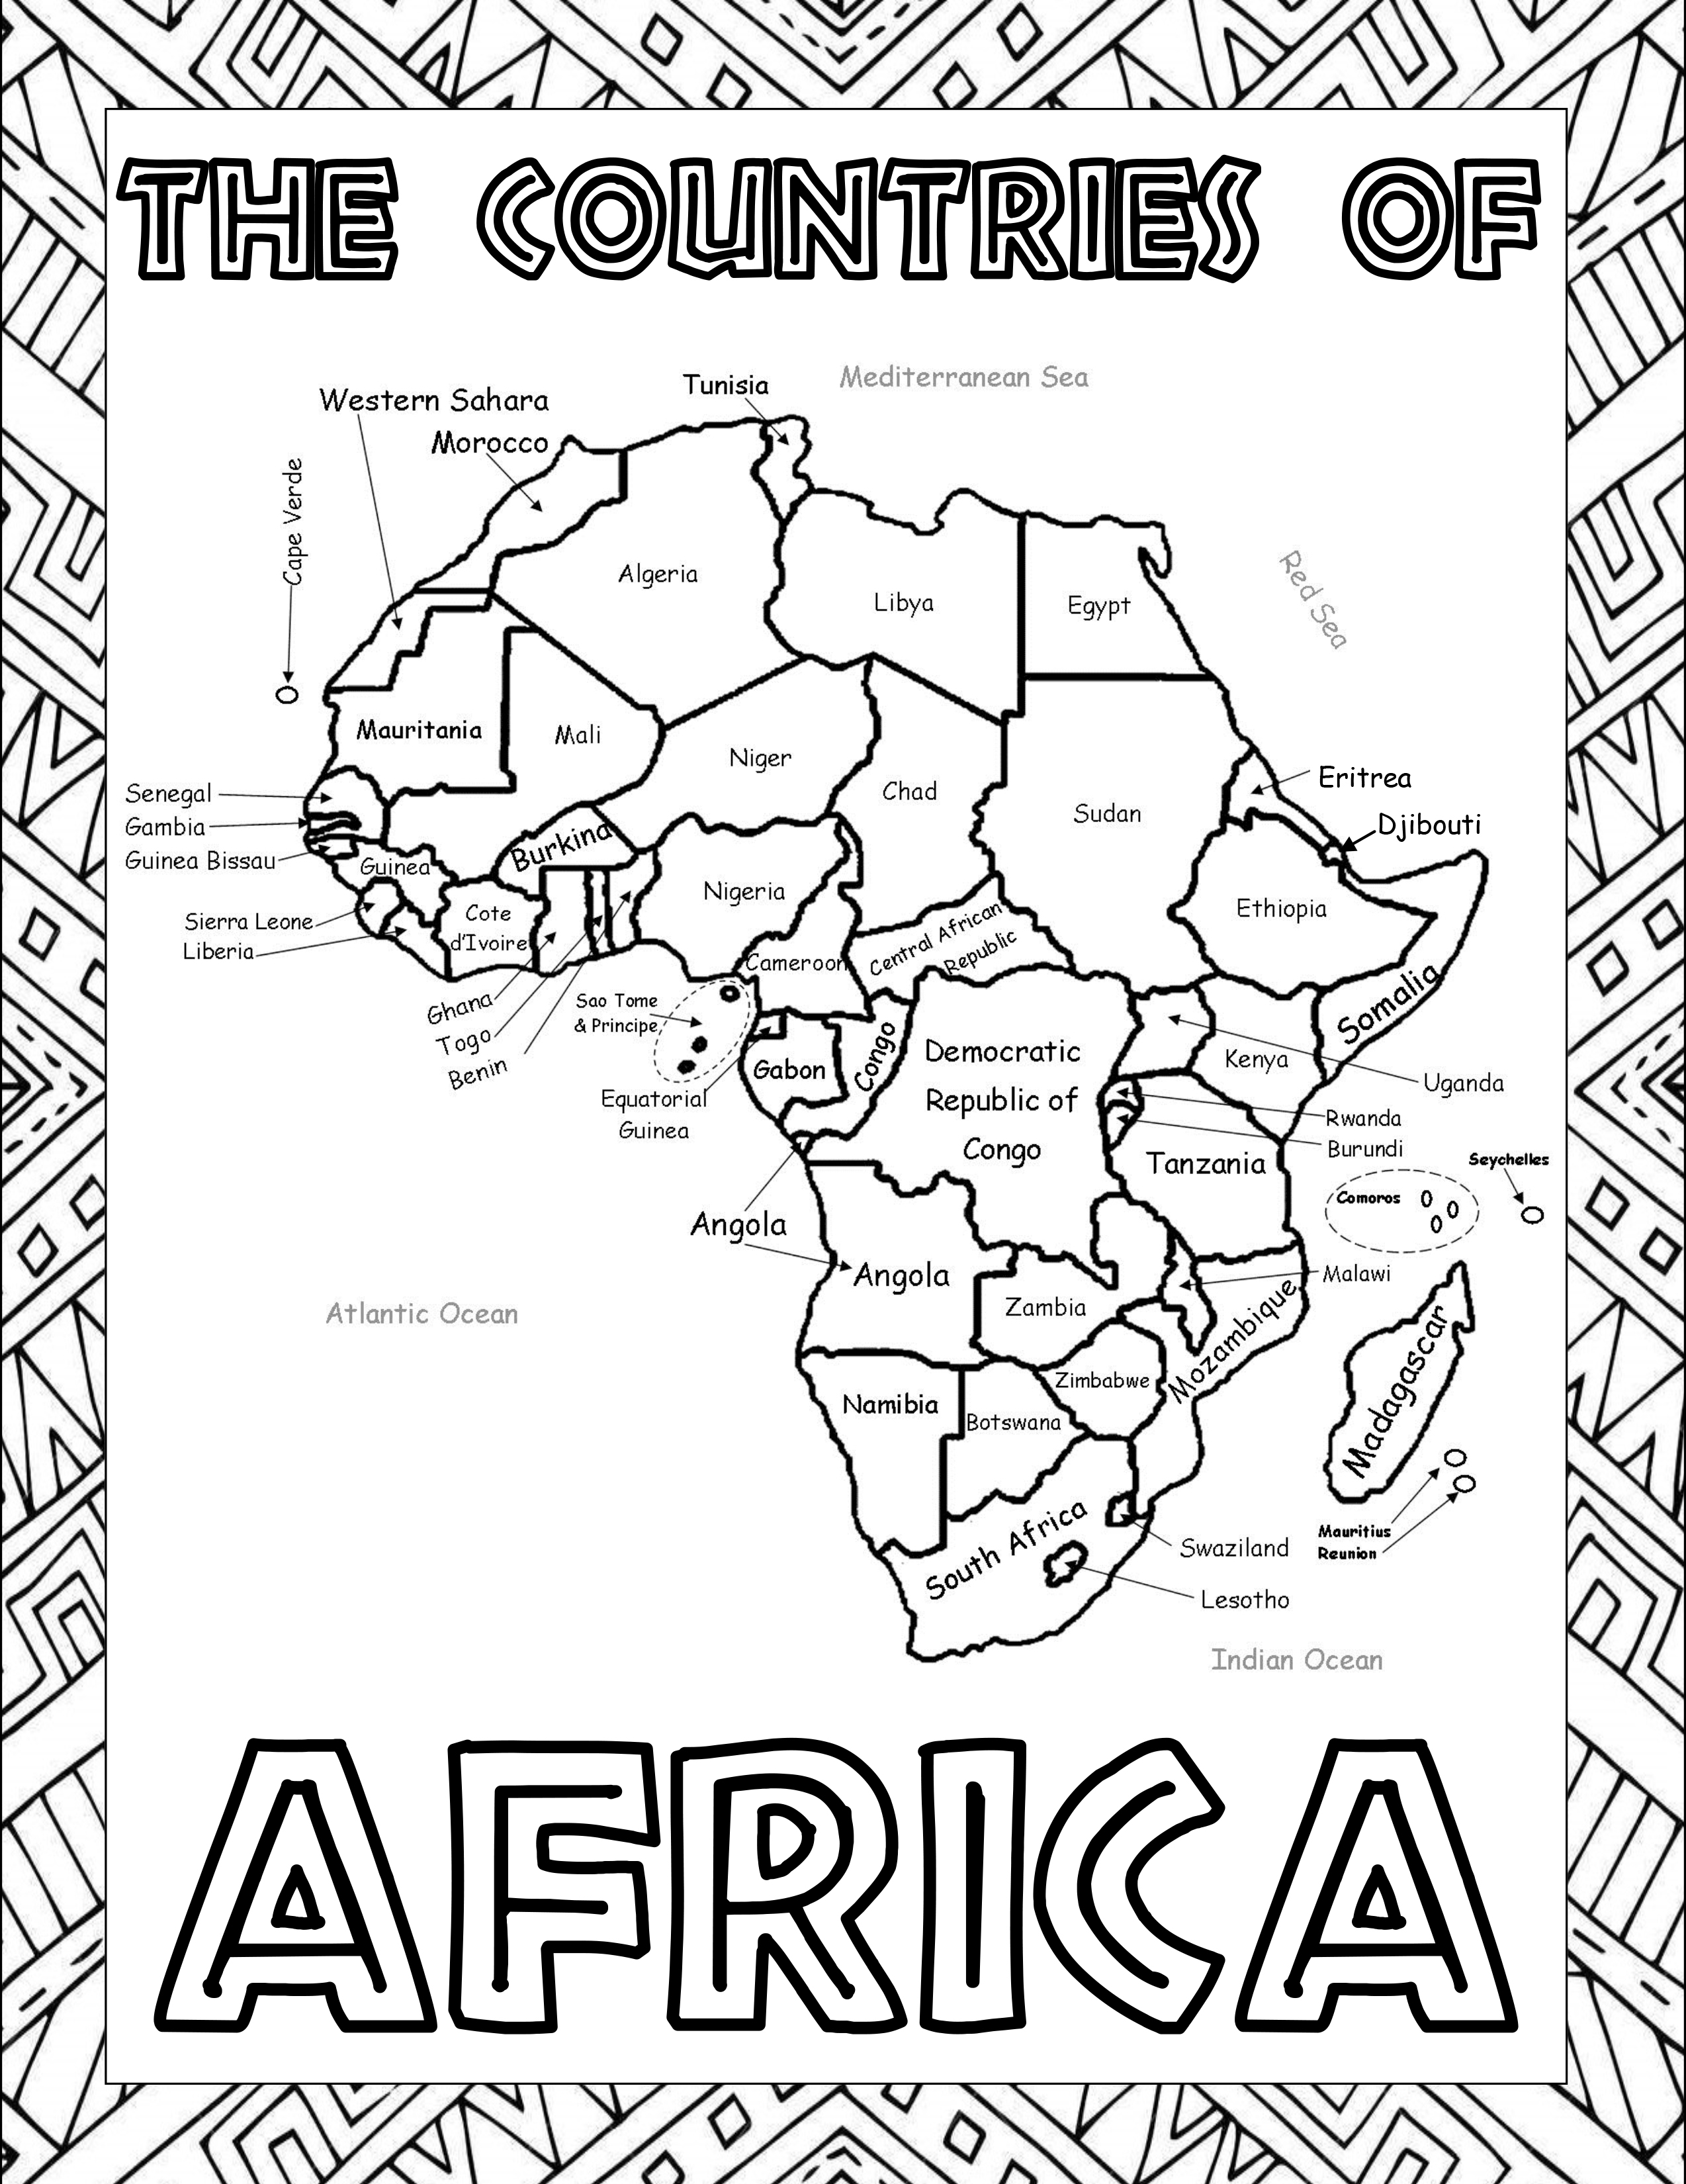 Africa A Geography Amp Intercessory Prayer Curriculum